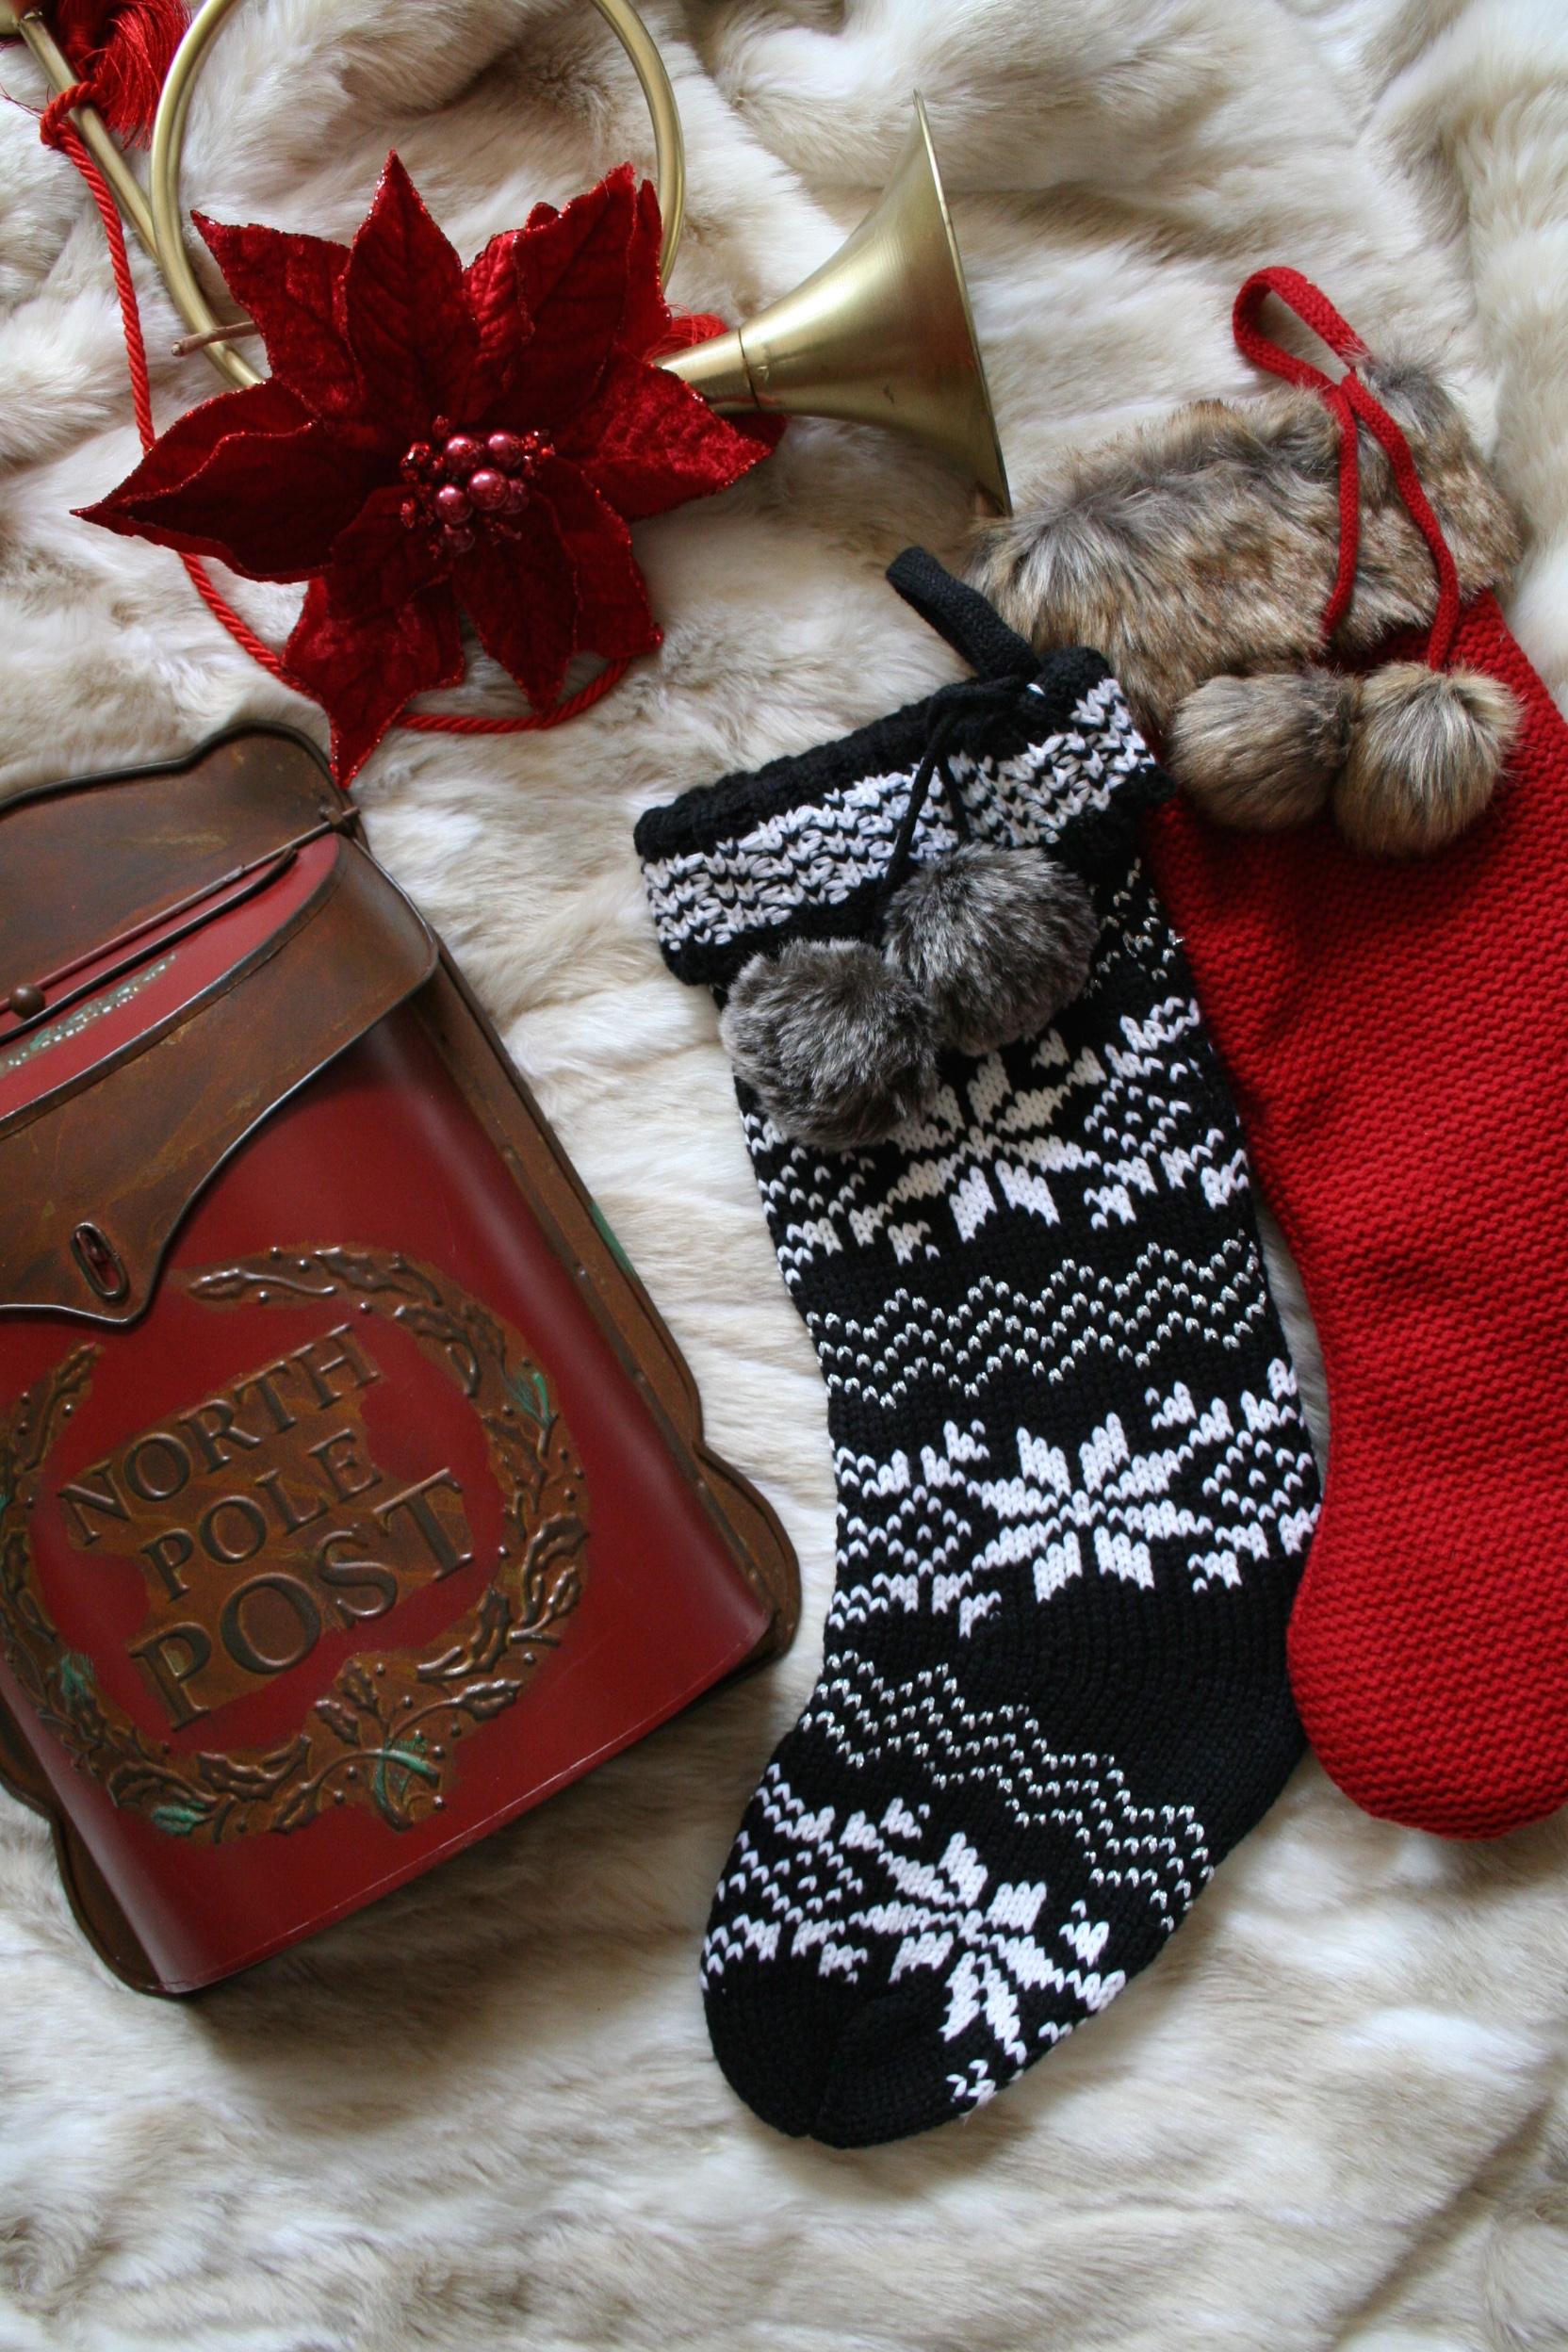 Christmas Stockings and Santa Post Box